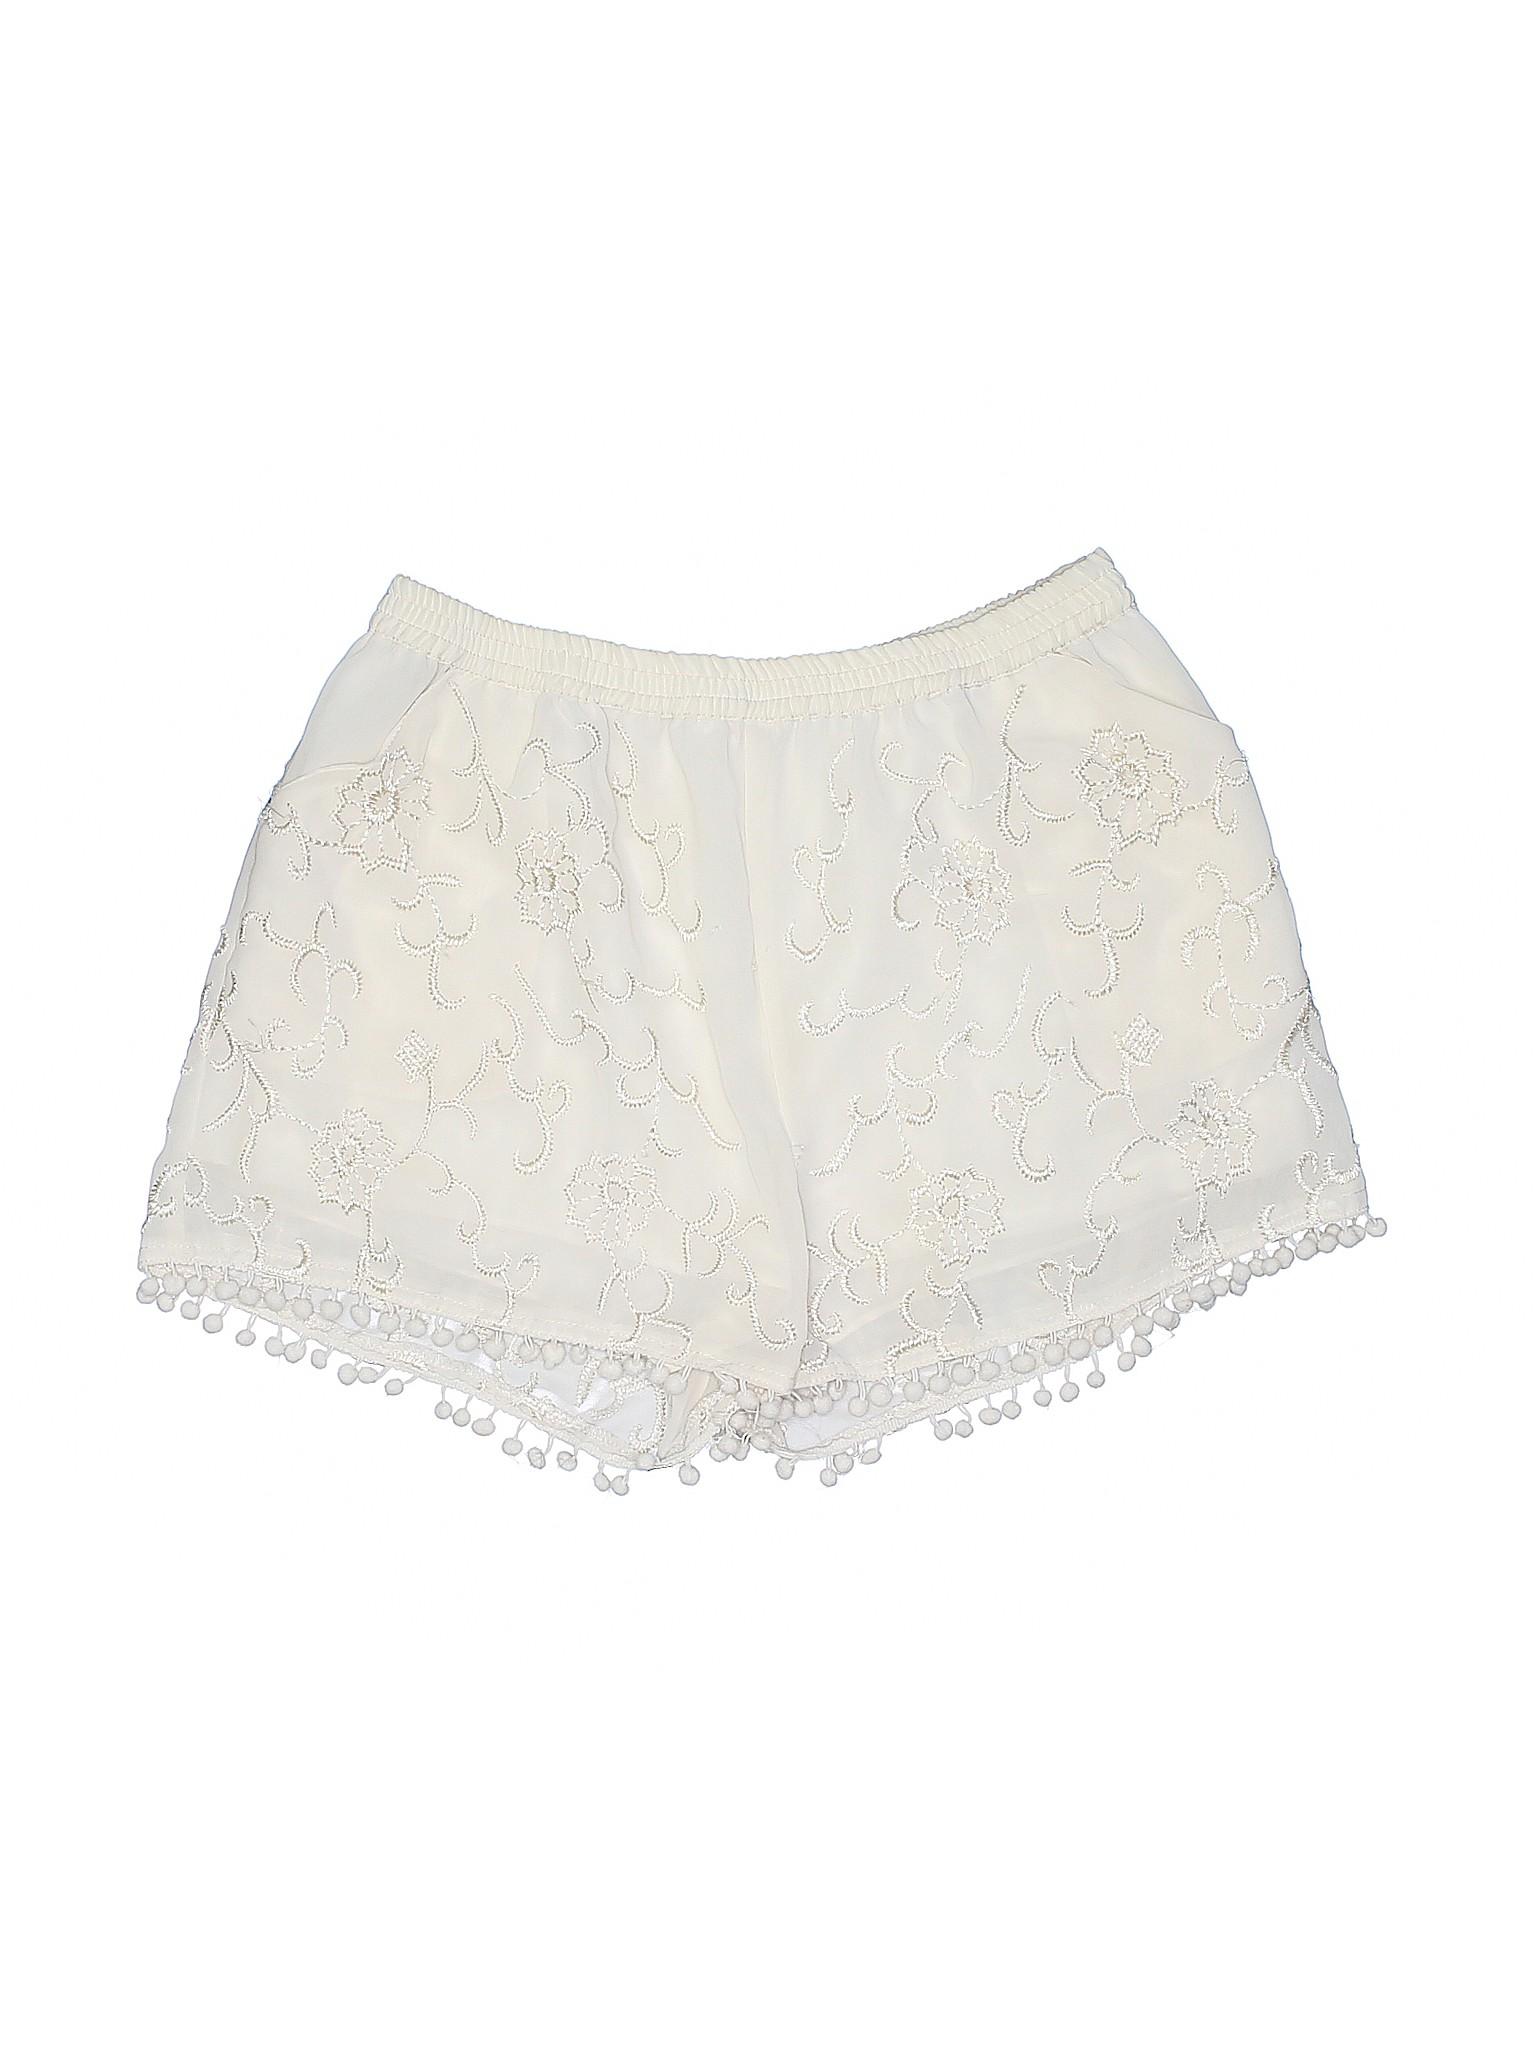 You Boutique Me amp; Shorts Between xCqCUwvaF